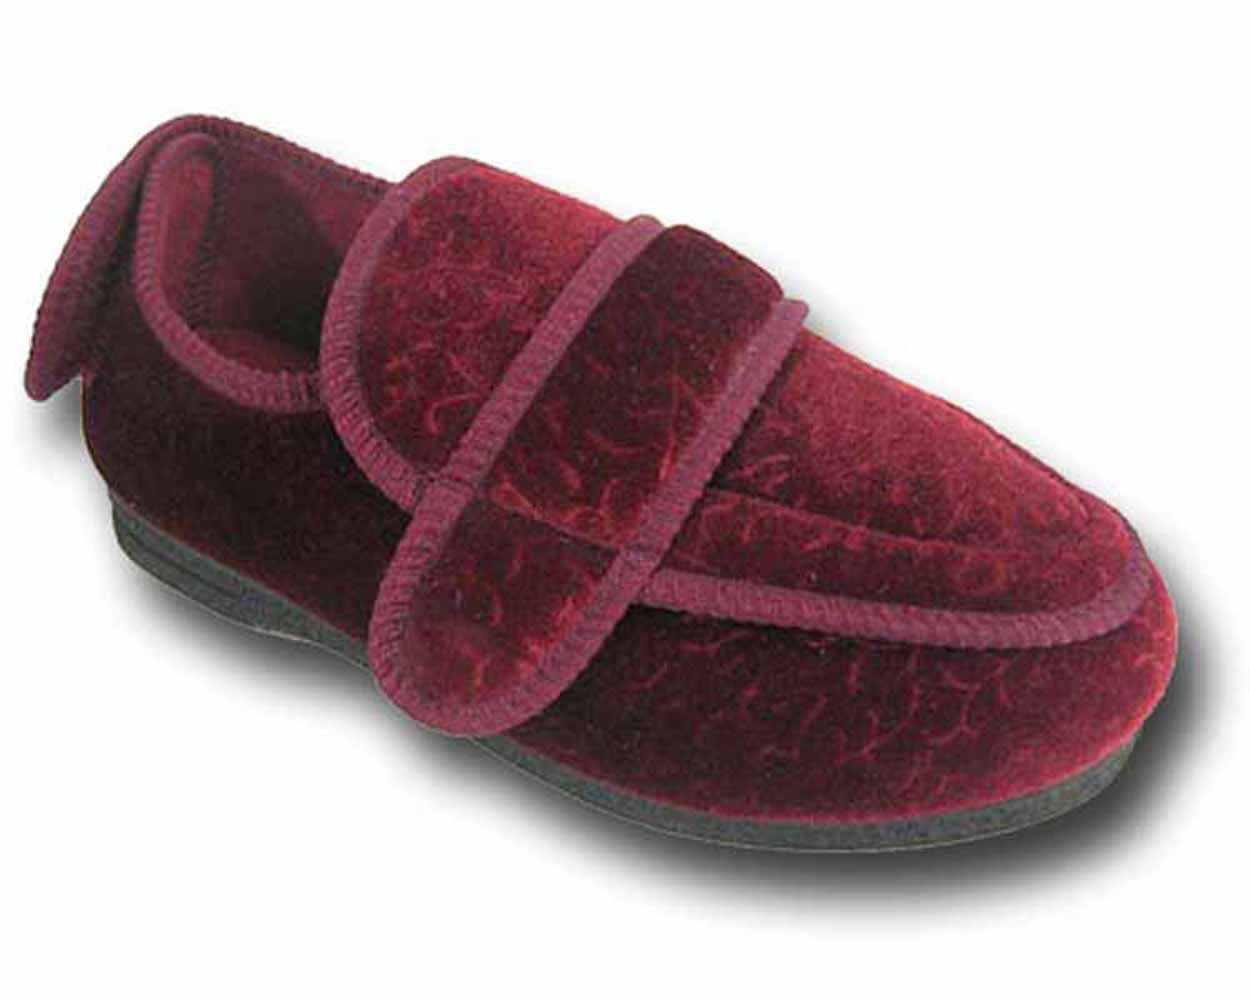 Coolers - Nuove pantofole da donna